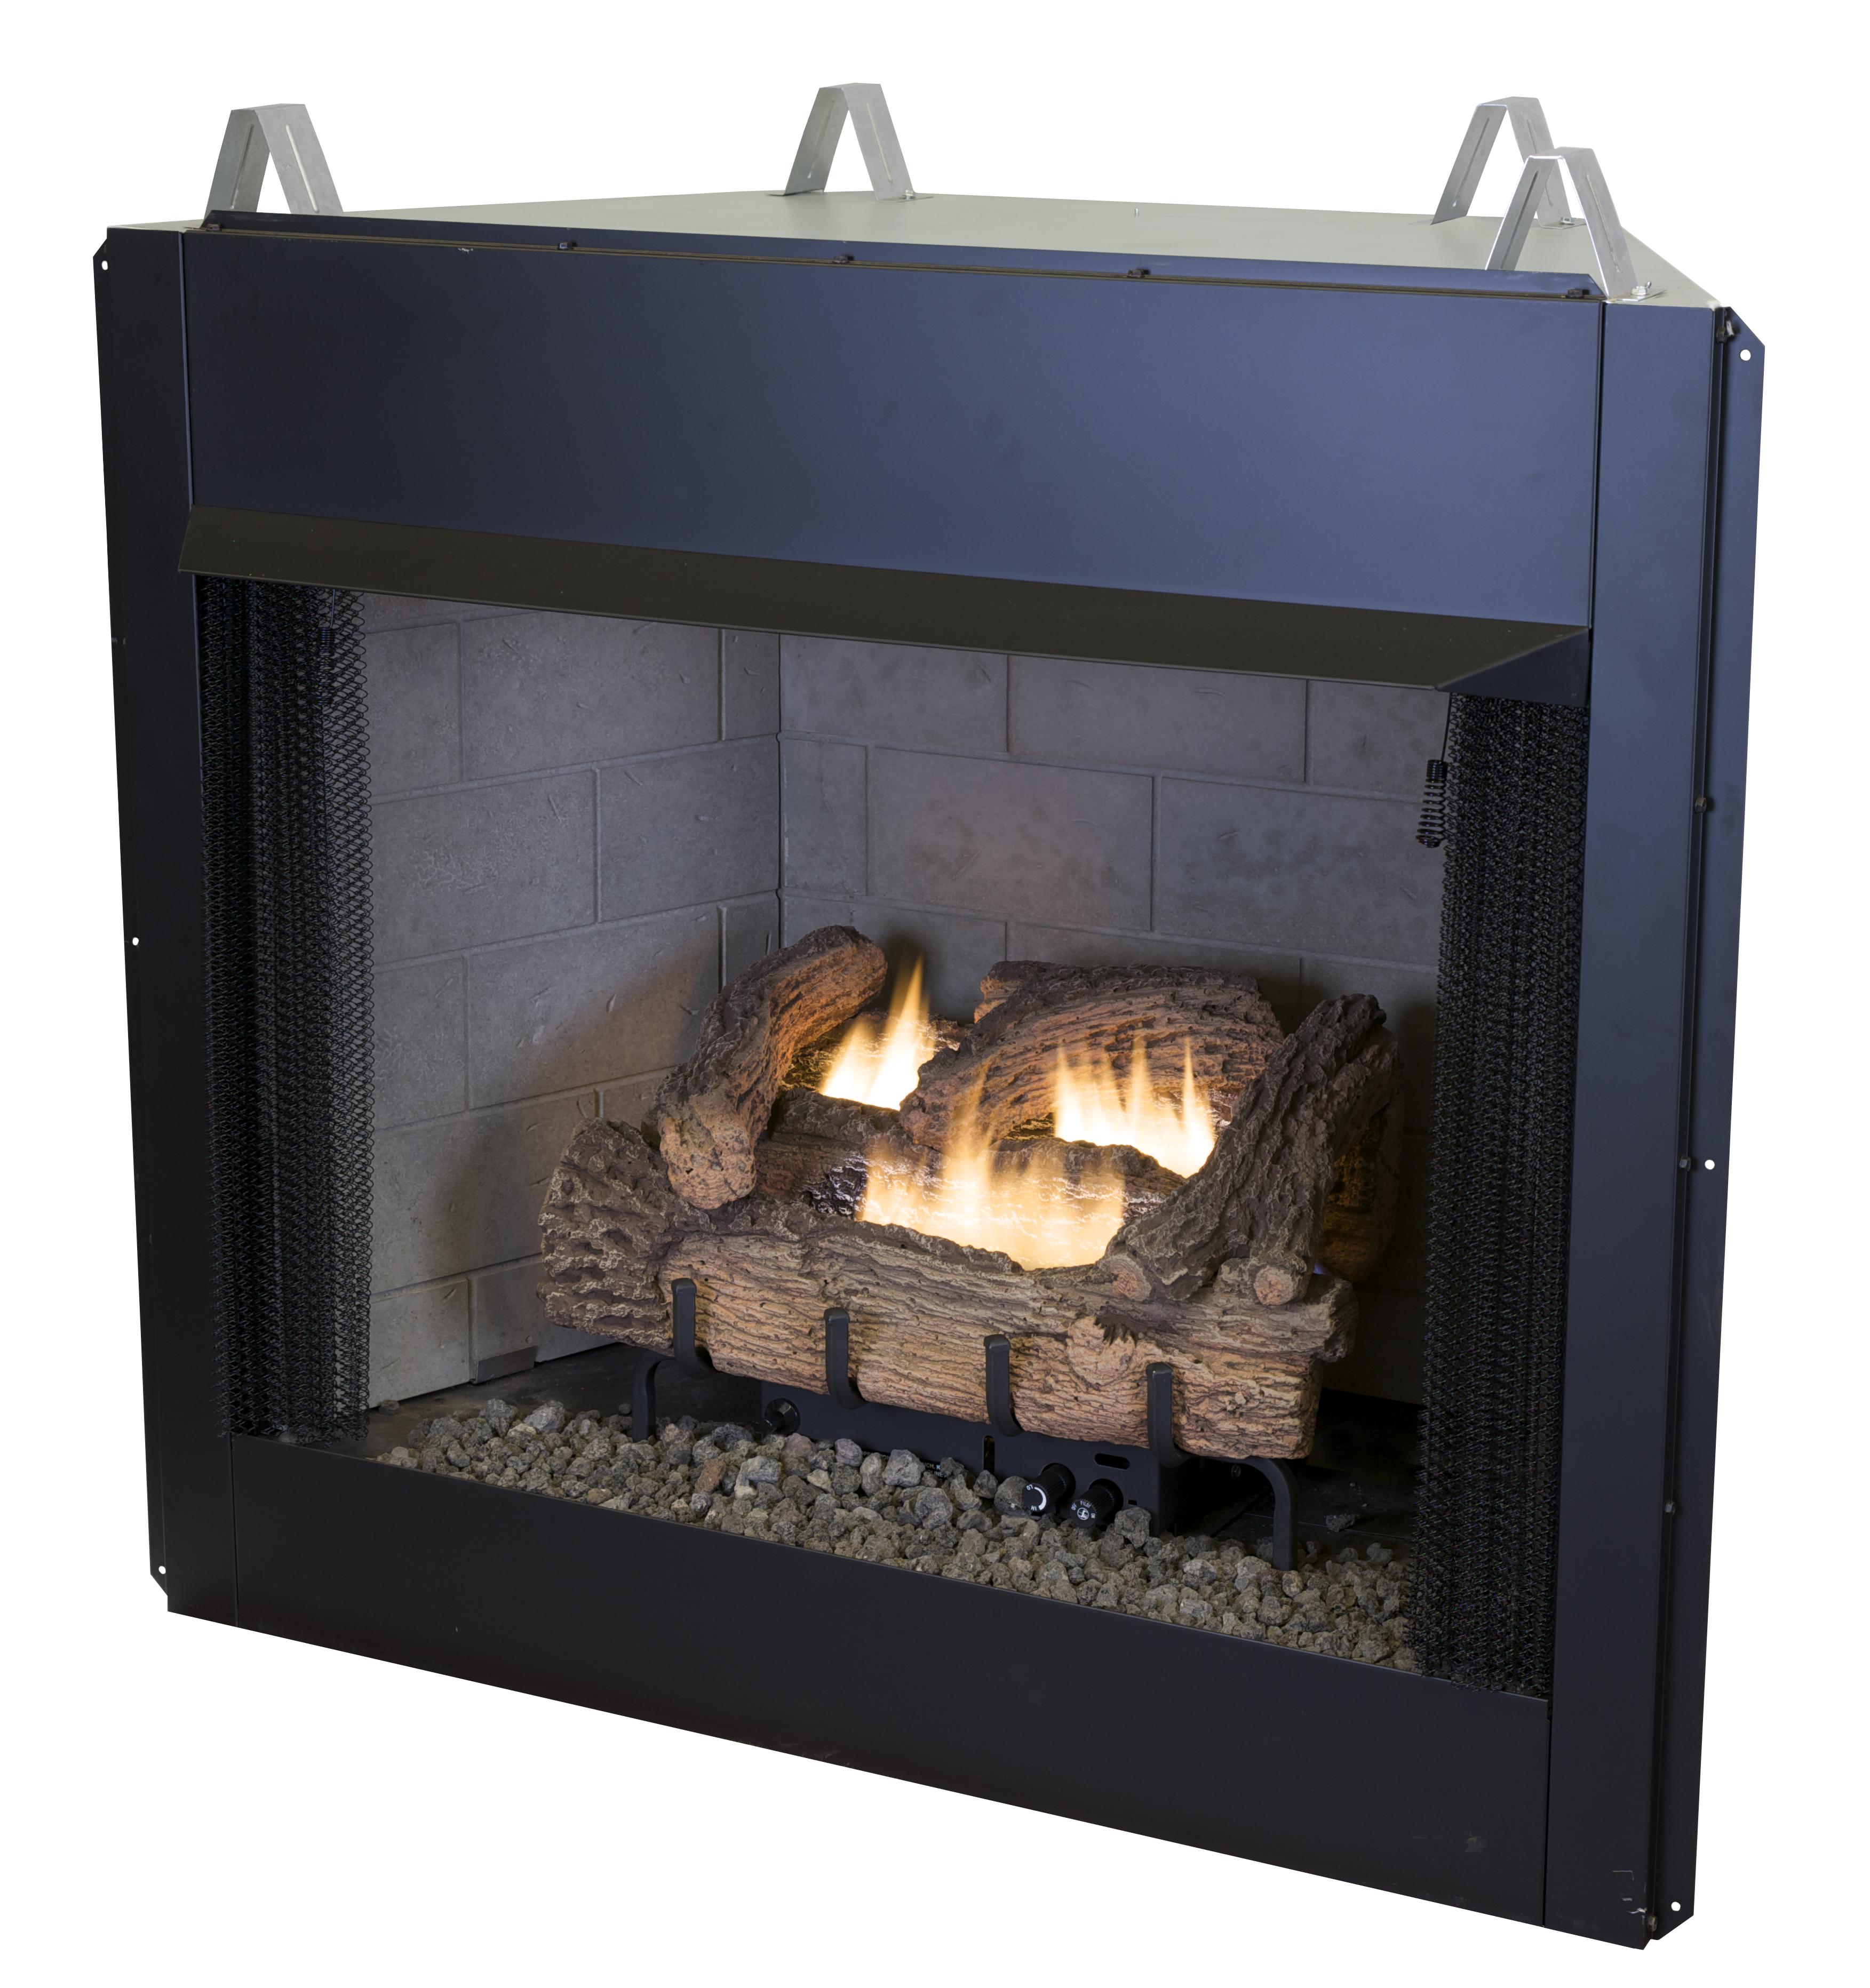 Everwarm Vent Free Fireplace